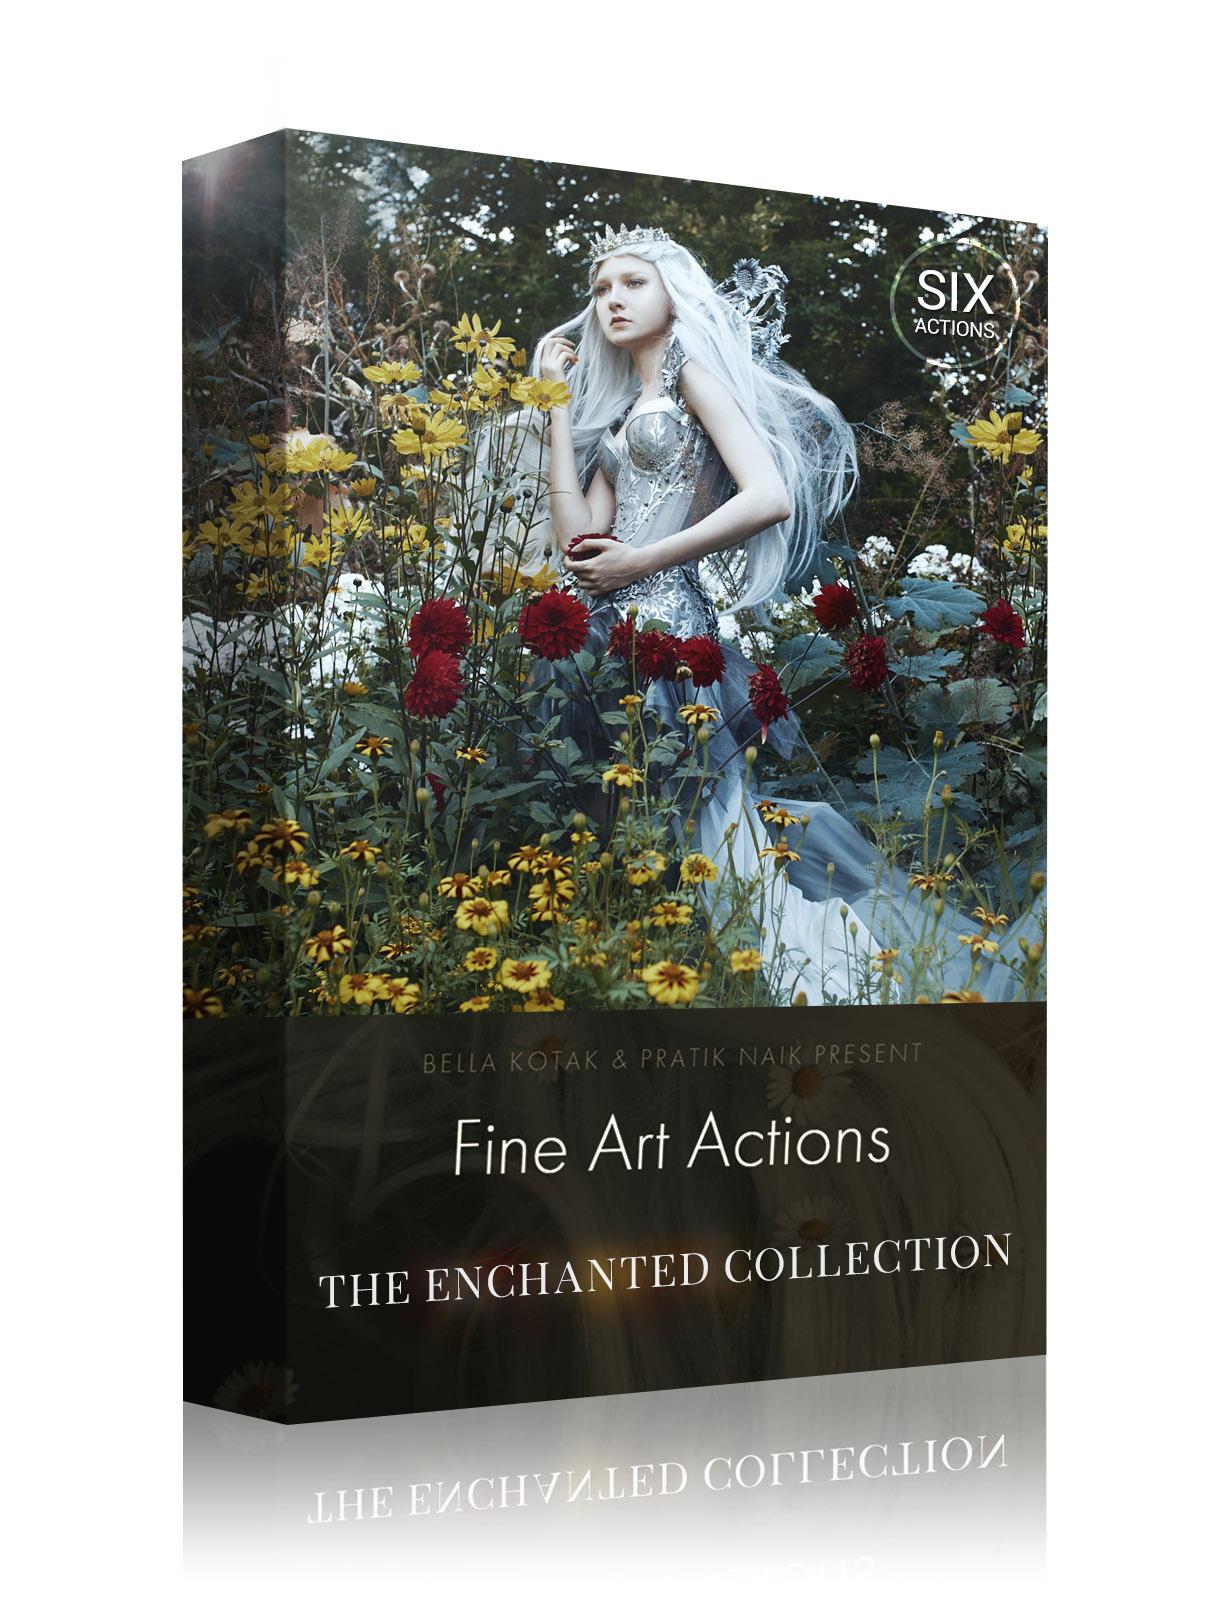 Box Design - The Enchanted Collection.jpg